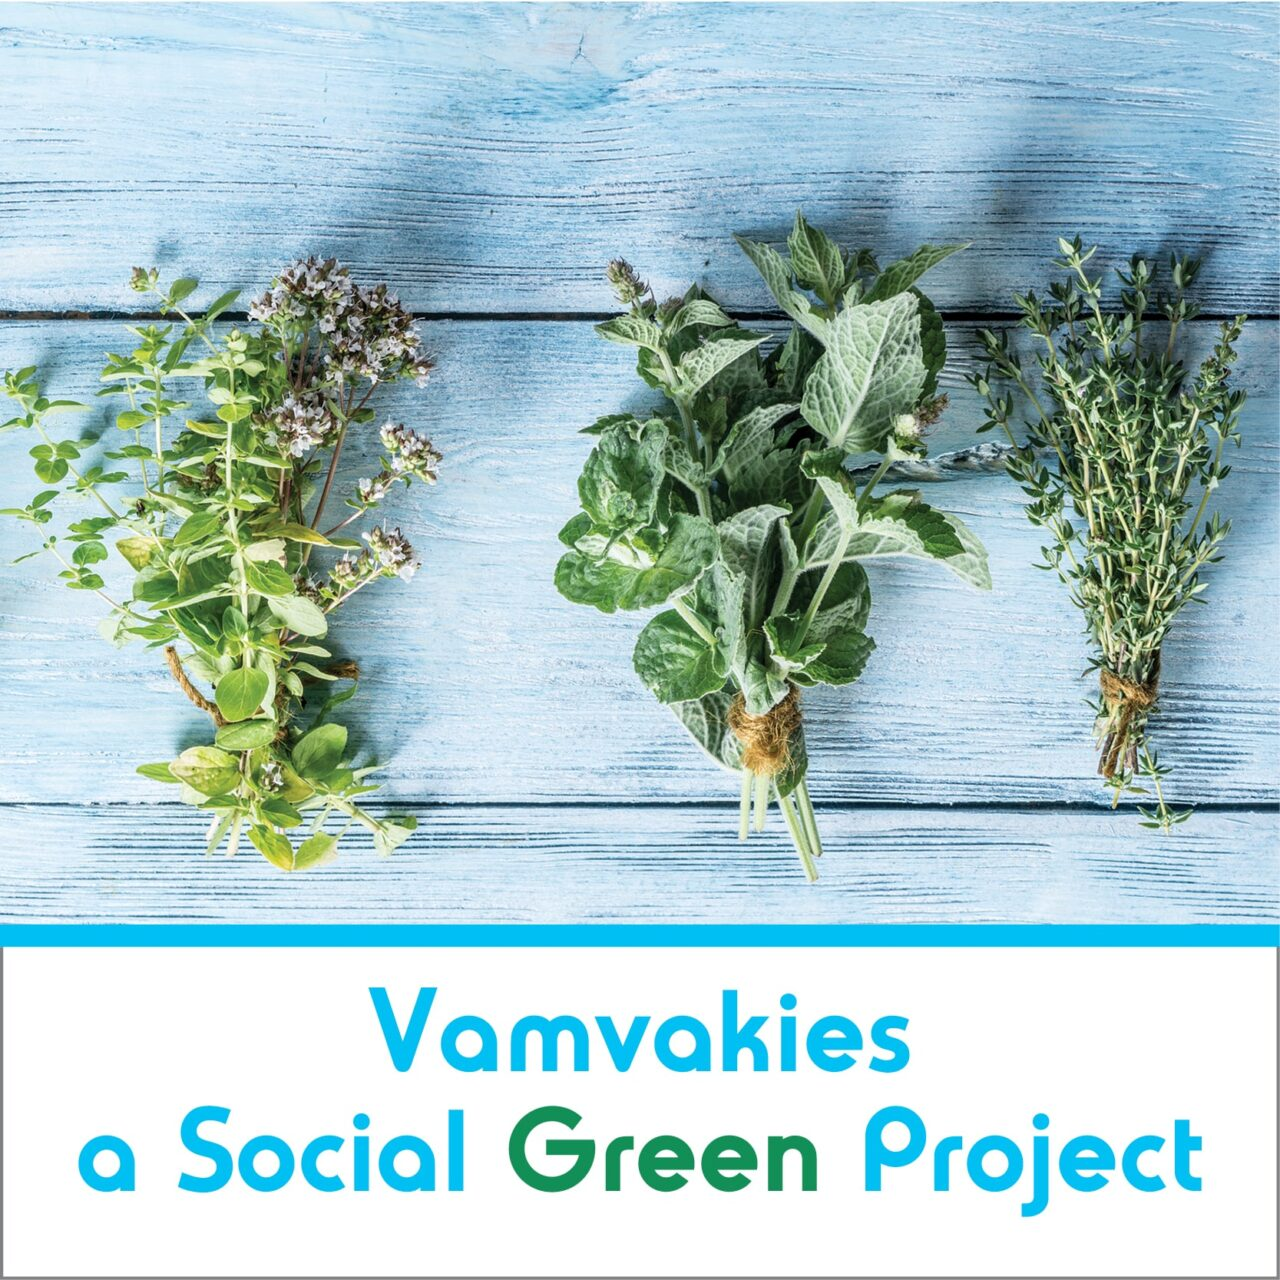 Vamvakies a Social Green Project